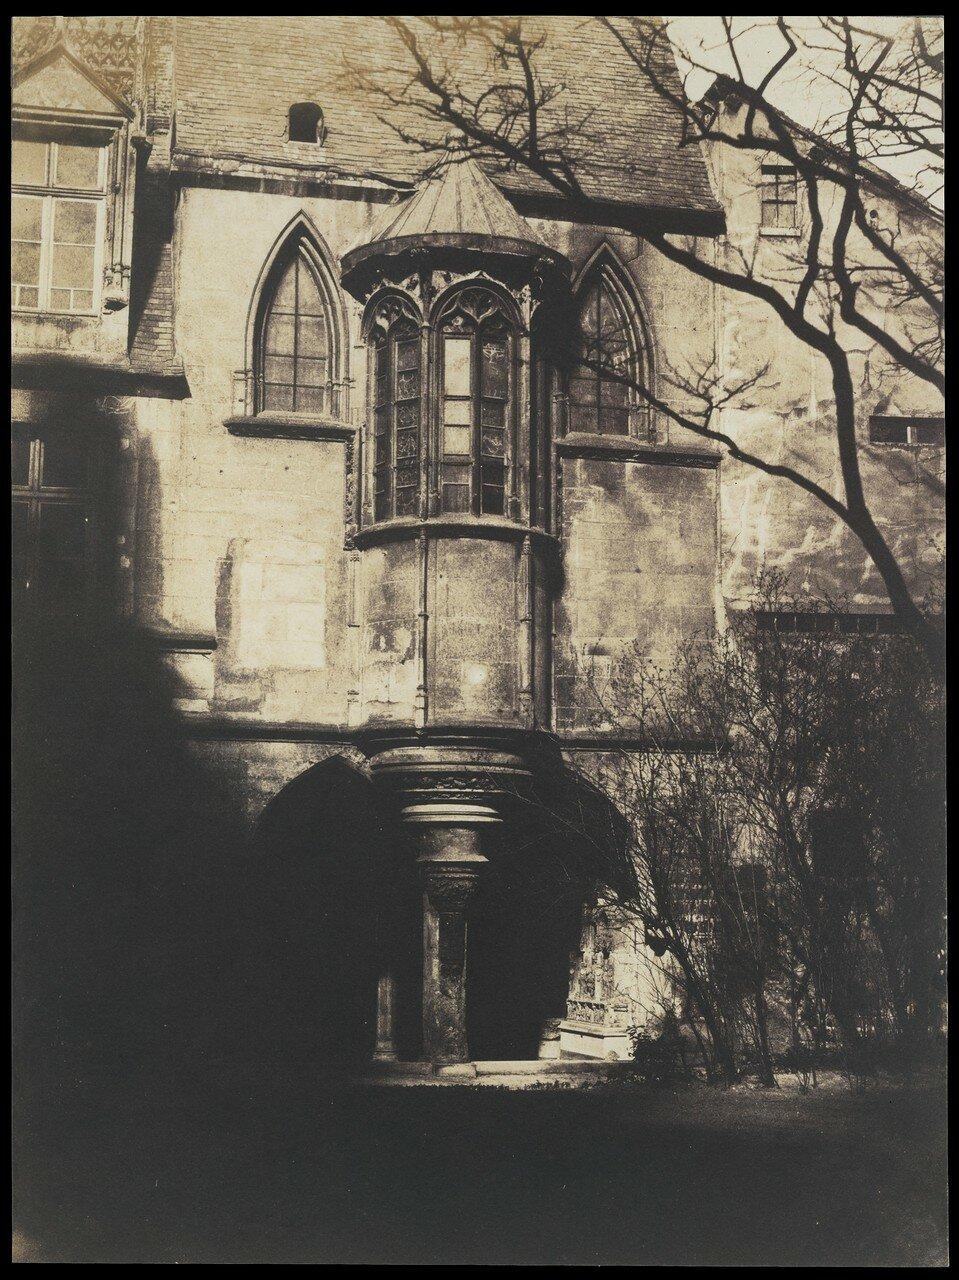 1851. Особняк Клюни